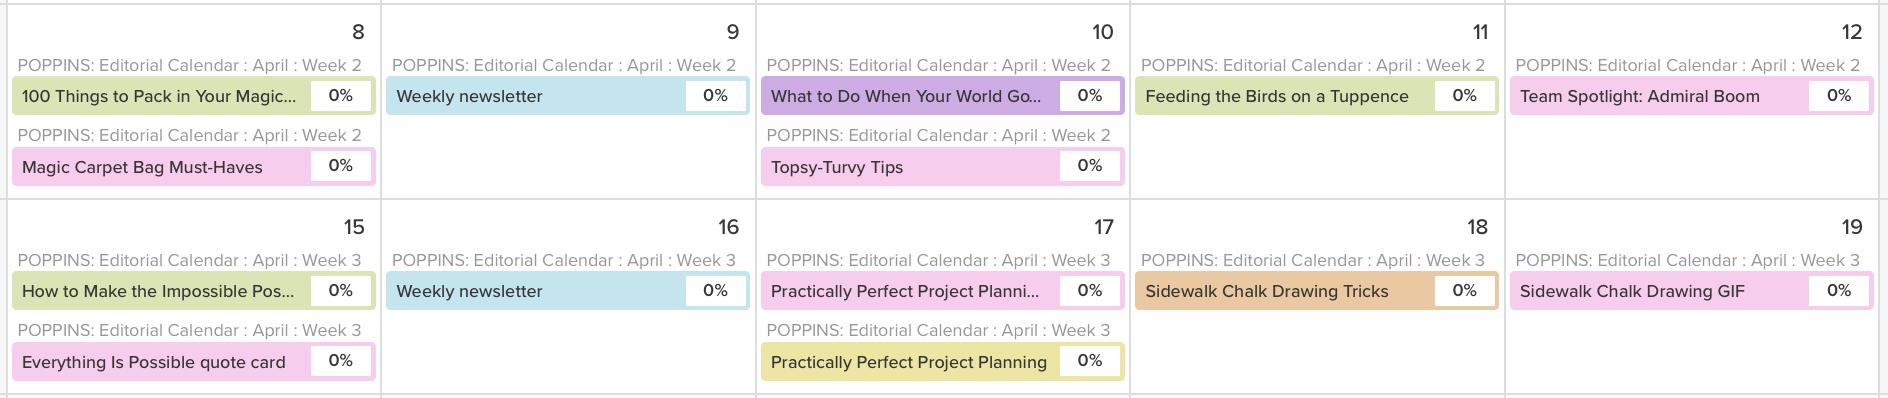 editorial calendar content types